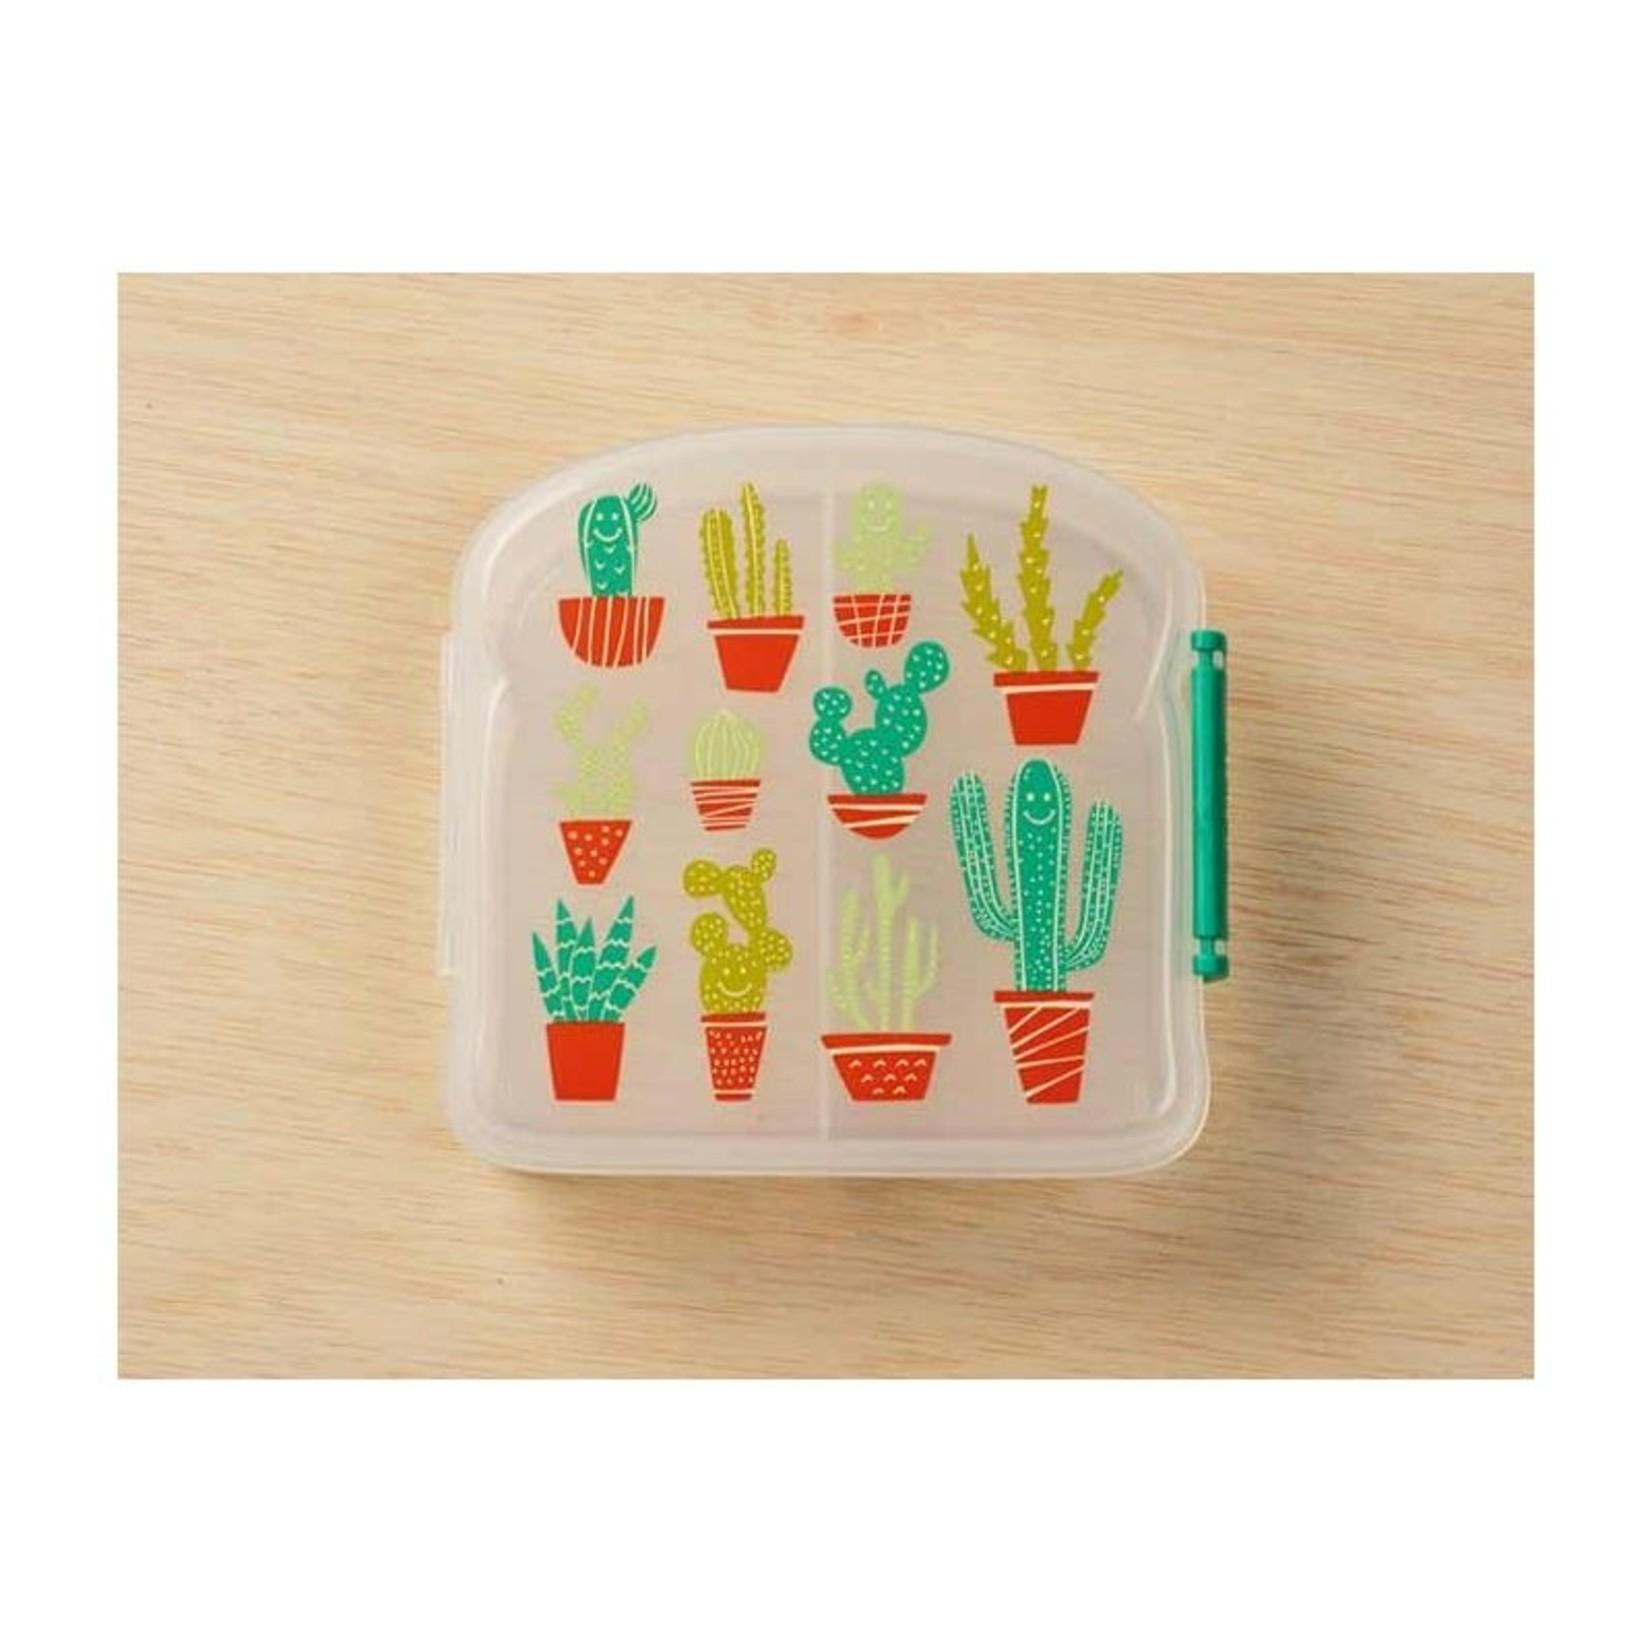 Sugarbooger Sugarbooger Good Lunch sandwich box Happy Cactus